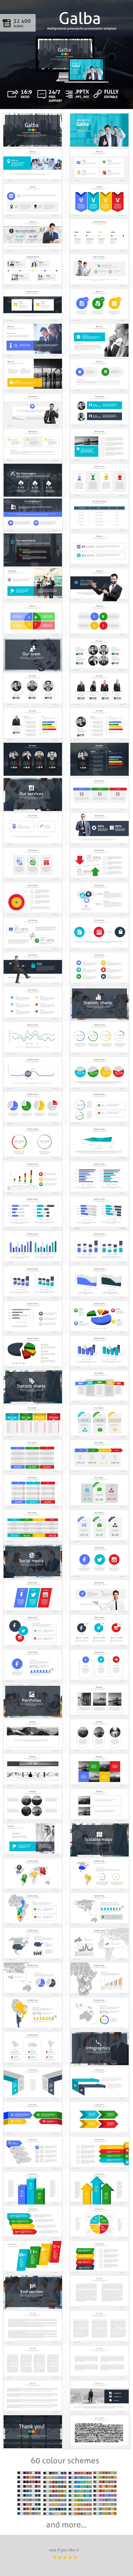 Galba Powerpoint Presentation Template. Download here: http://graphicriver.net/item/galba-powerpoint-presentation-template/15733836?ref=ksioks